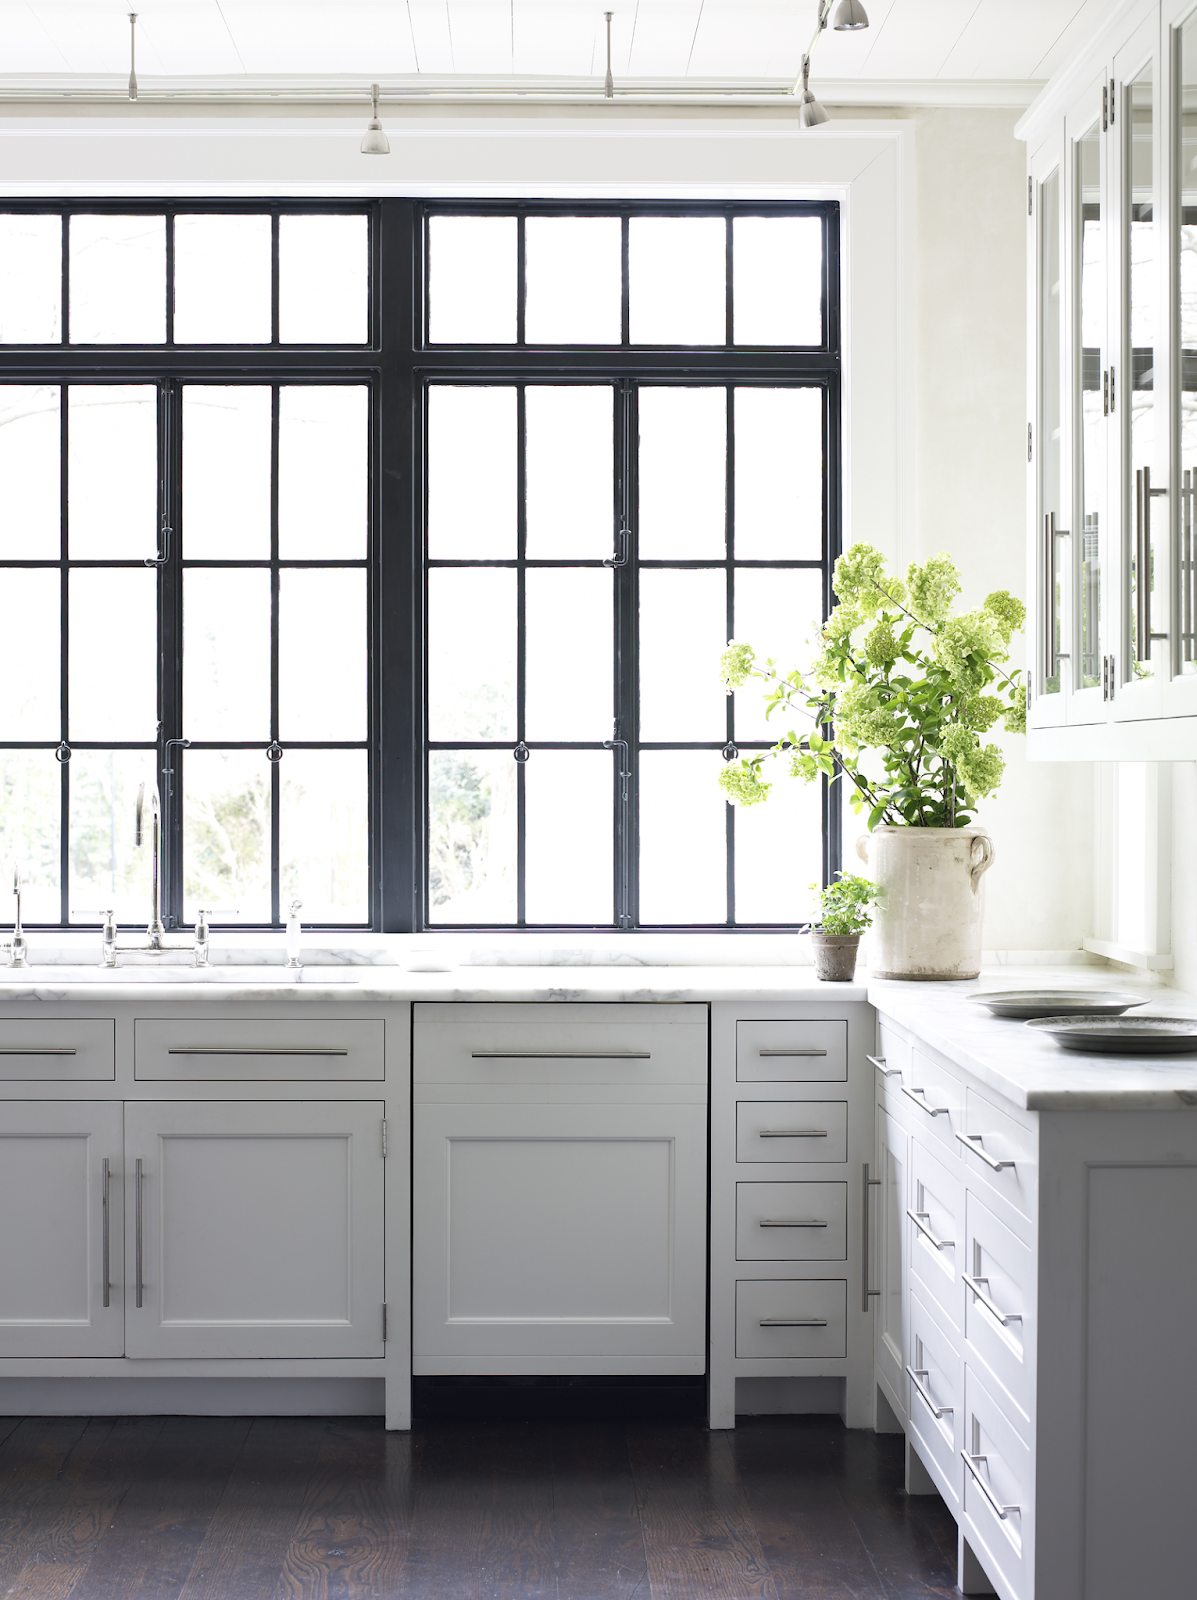 How To Make a Decorative Black Window Frame Insert   Rambling ...